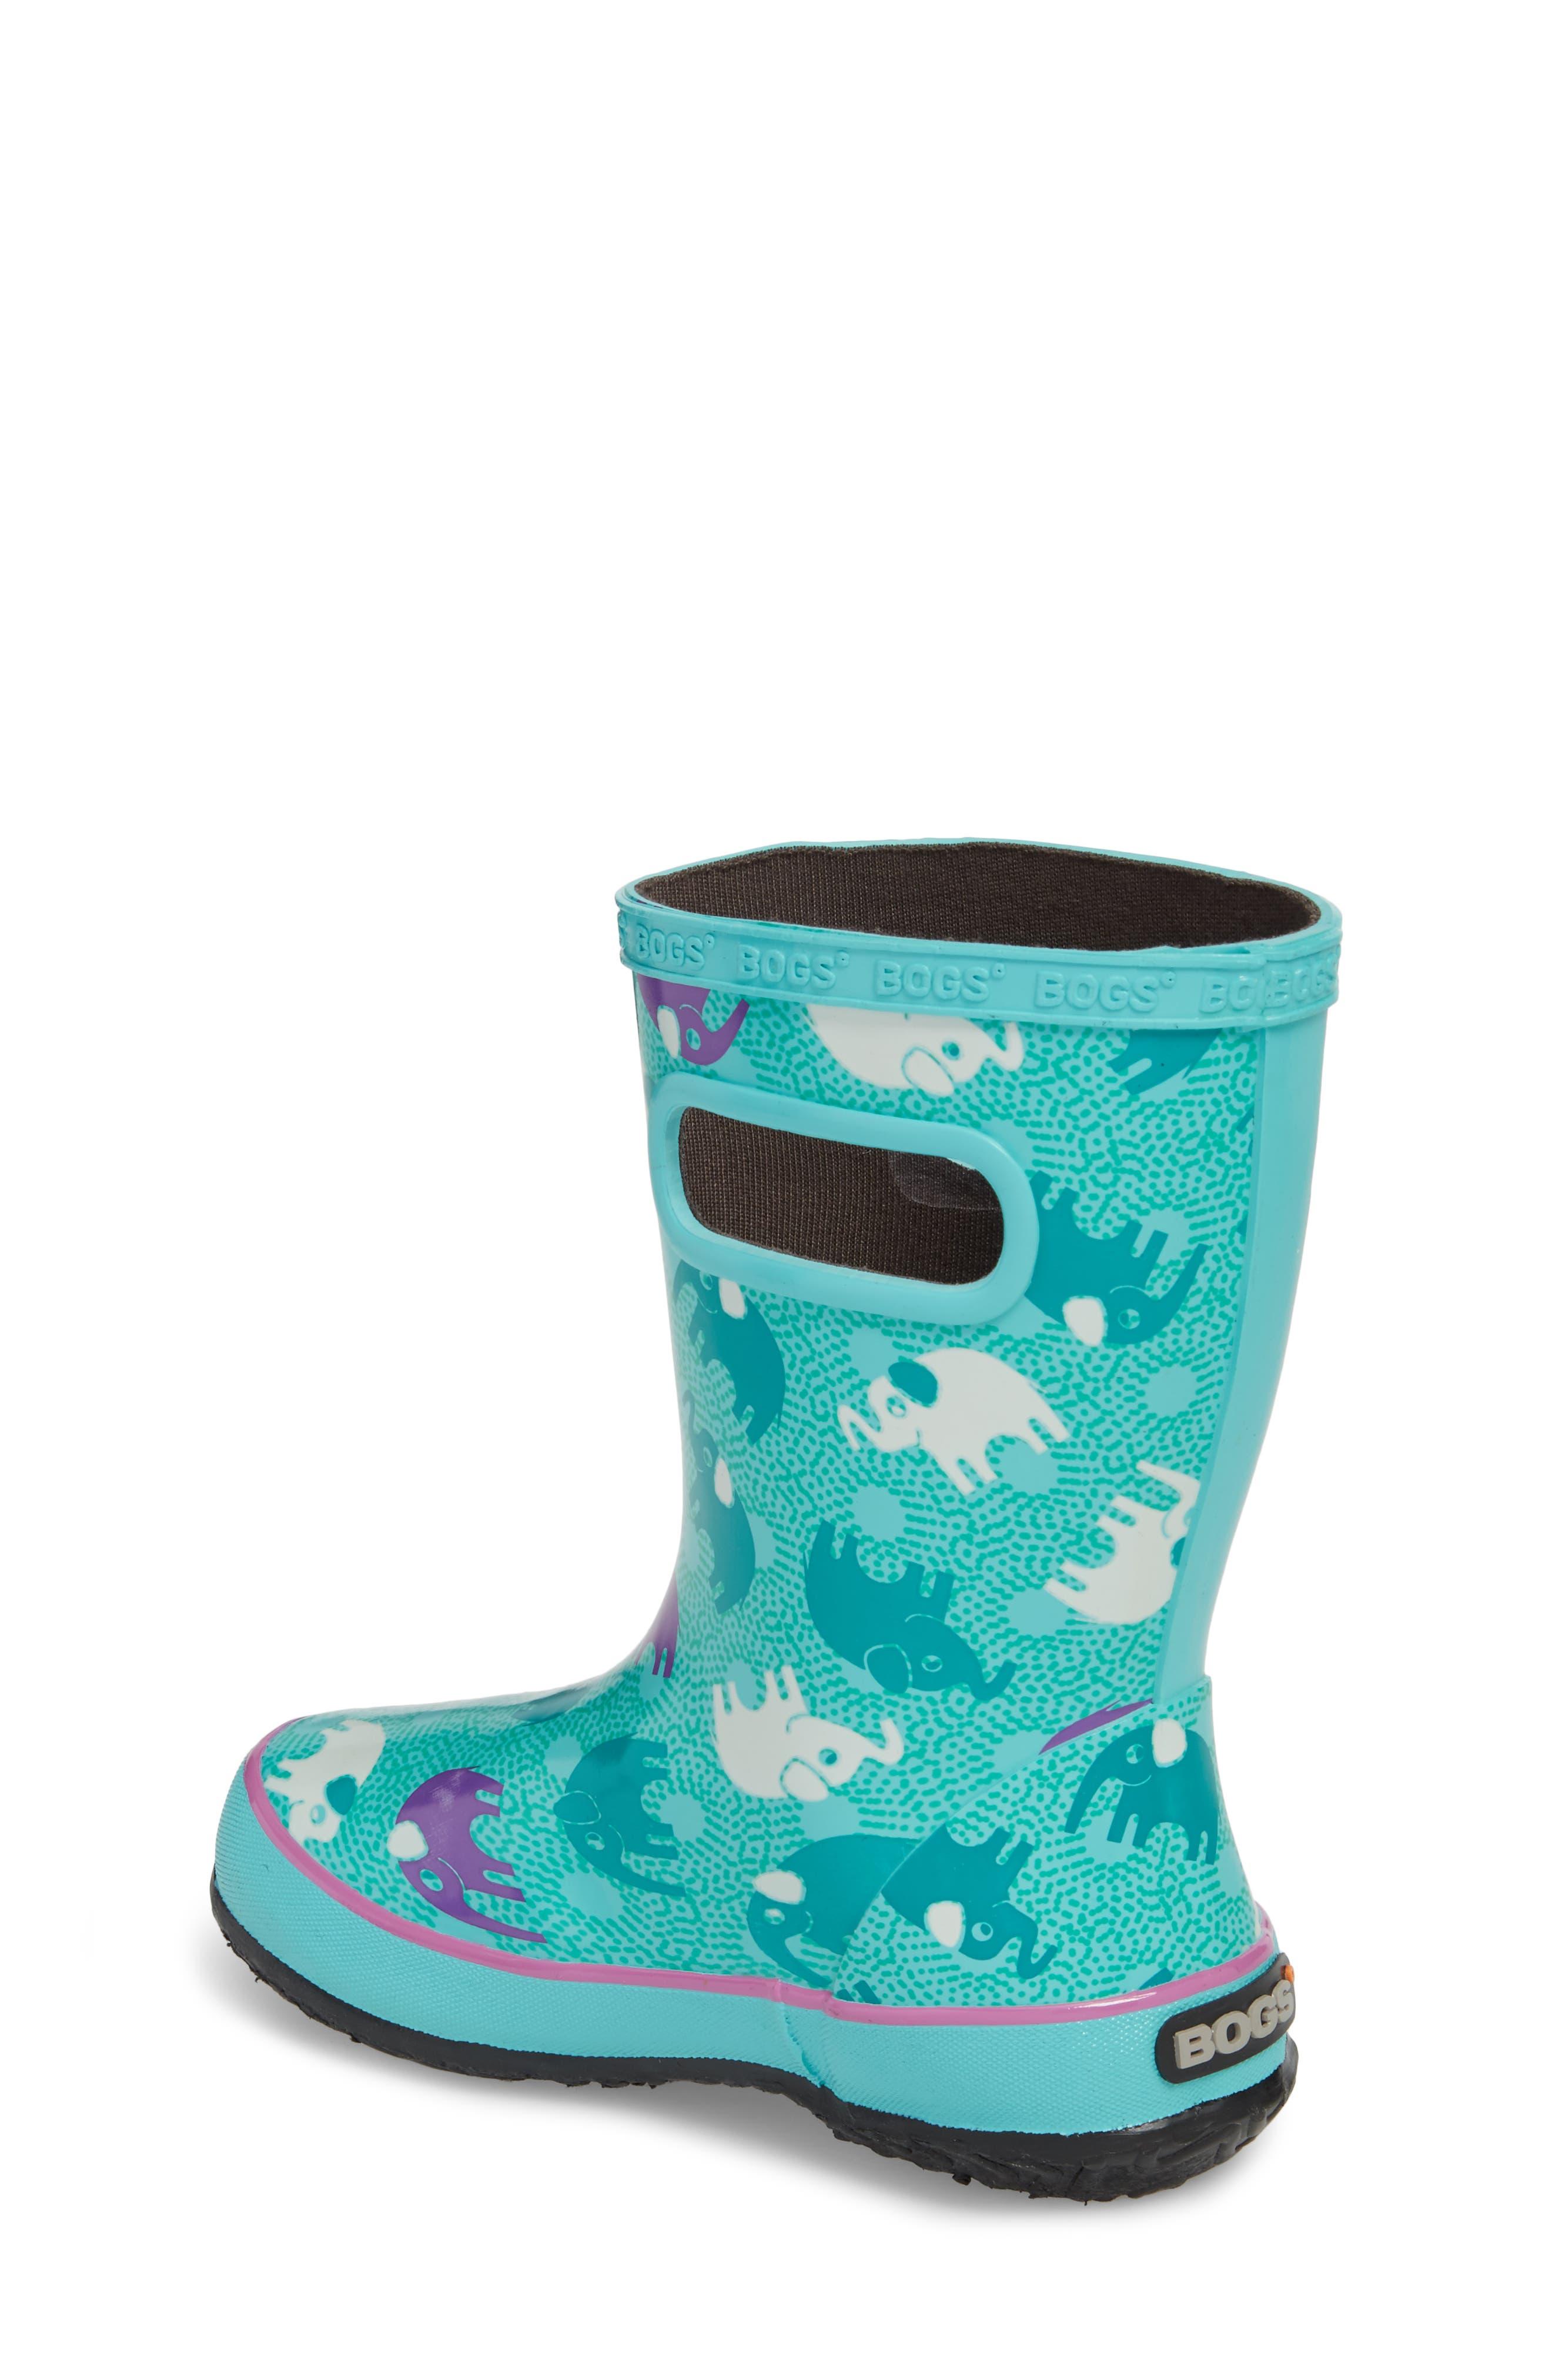 BOGS, Skipper Elephant Print Rubber Waterproof Rain Boot, Alternate thumbnail 2, color, TURQUOISE MULTI